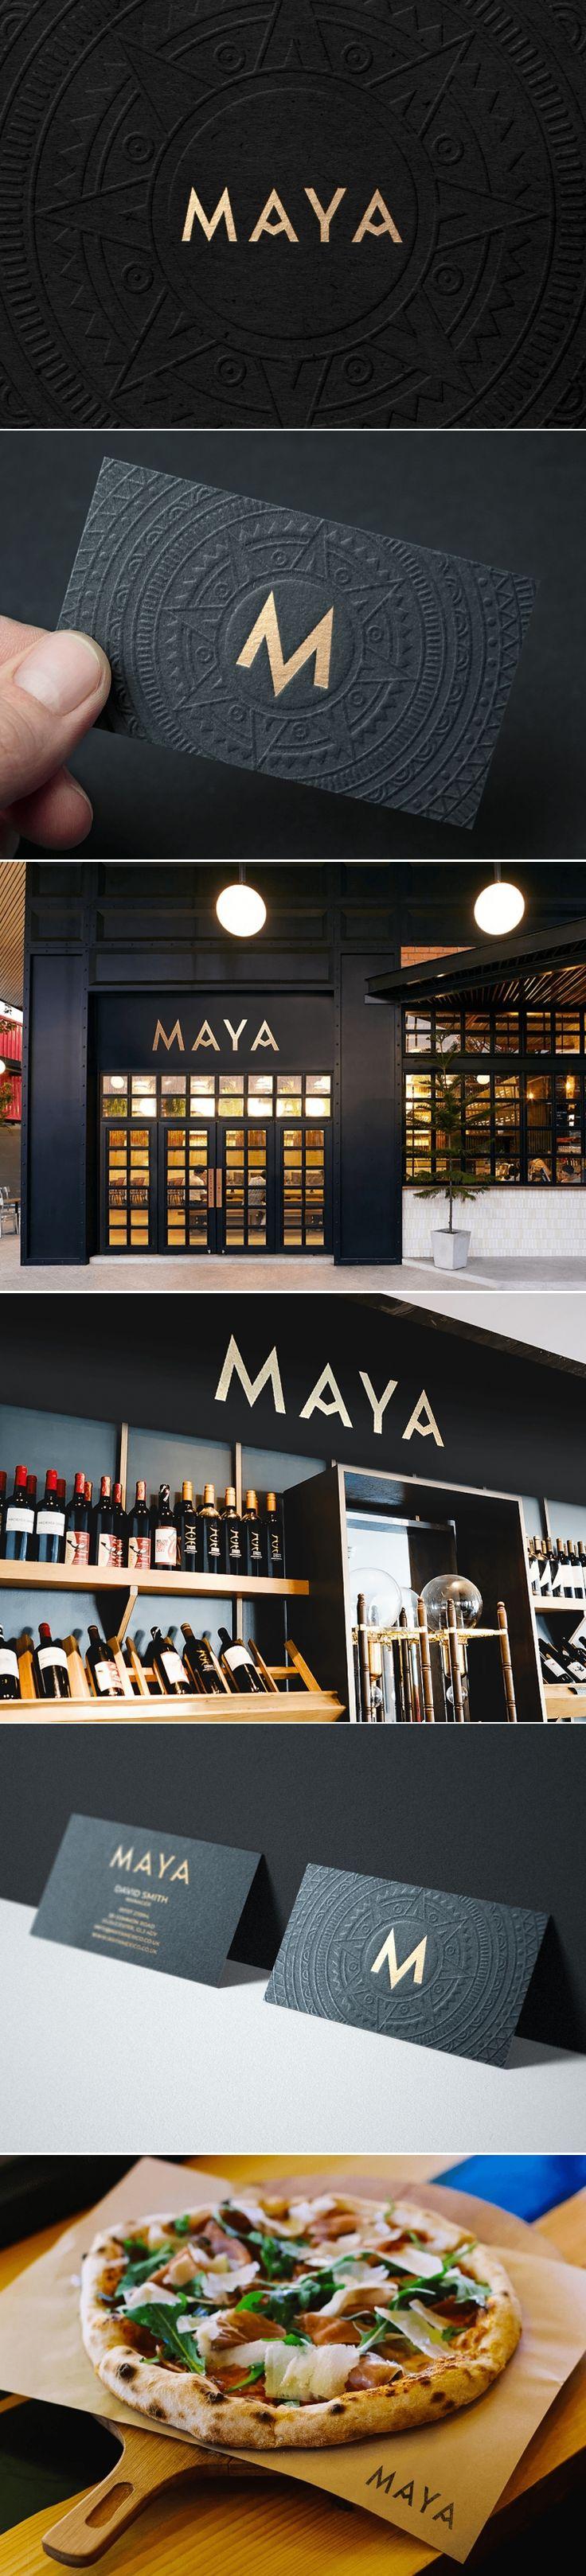 Maya mexican restaurant brand design by MK Creativ…